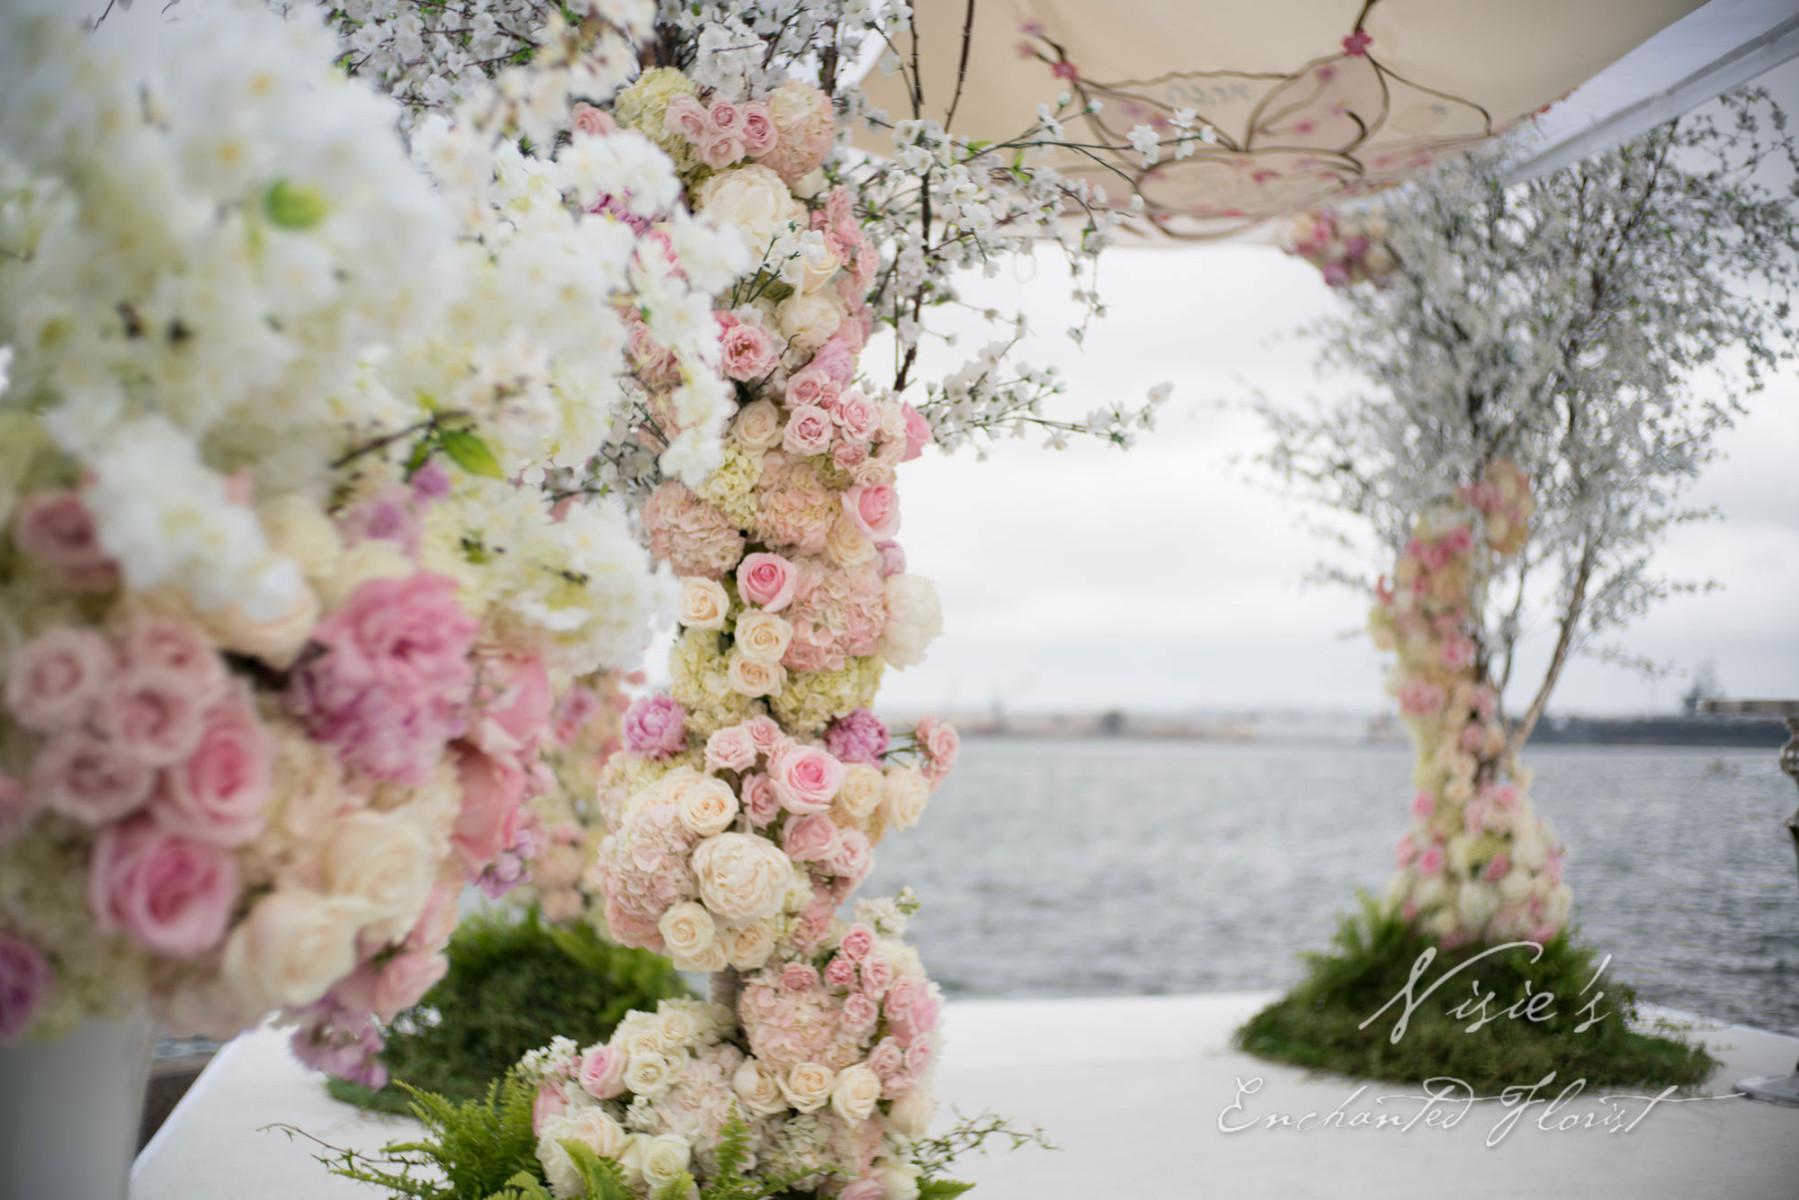 Jose's Wedding – Port Pavilion – Nisie's Enchanted – wtrmrkd (6)